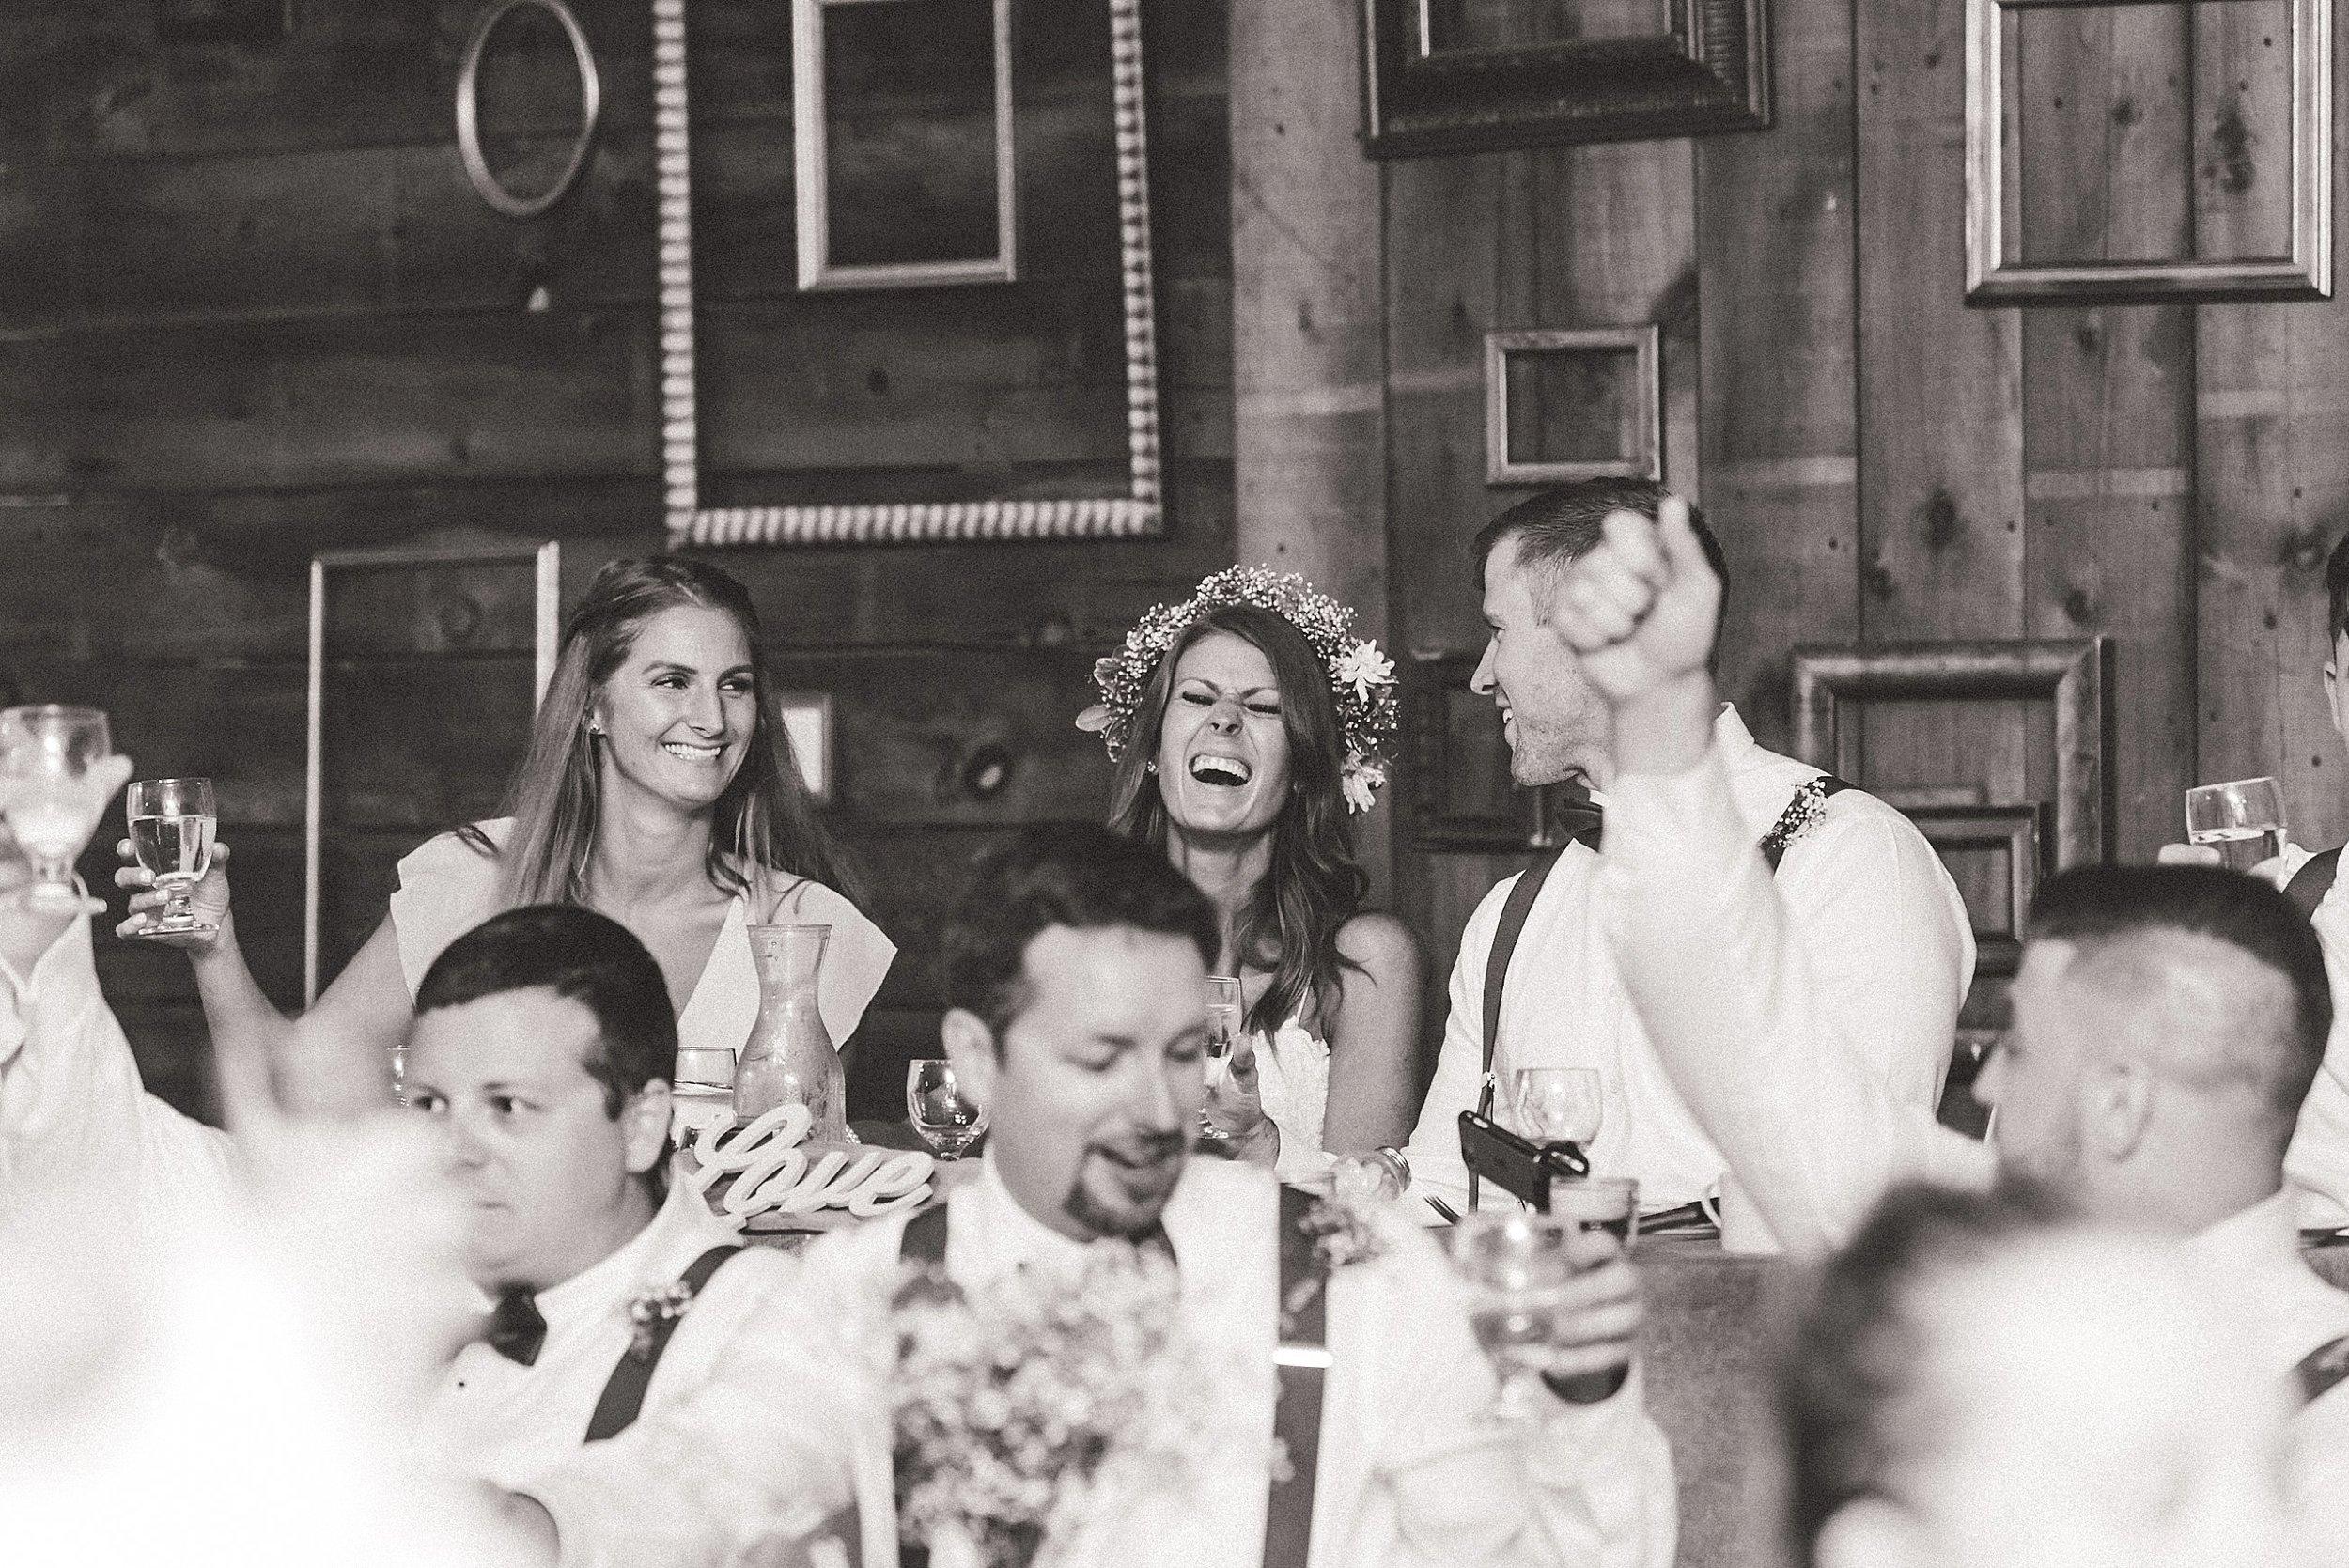 Ottawa Wedding Photographer - Stanley's Olde Maple Lane Barn Wedding - Ali & Batoul Photography_0066.jpg